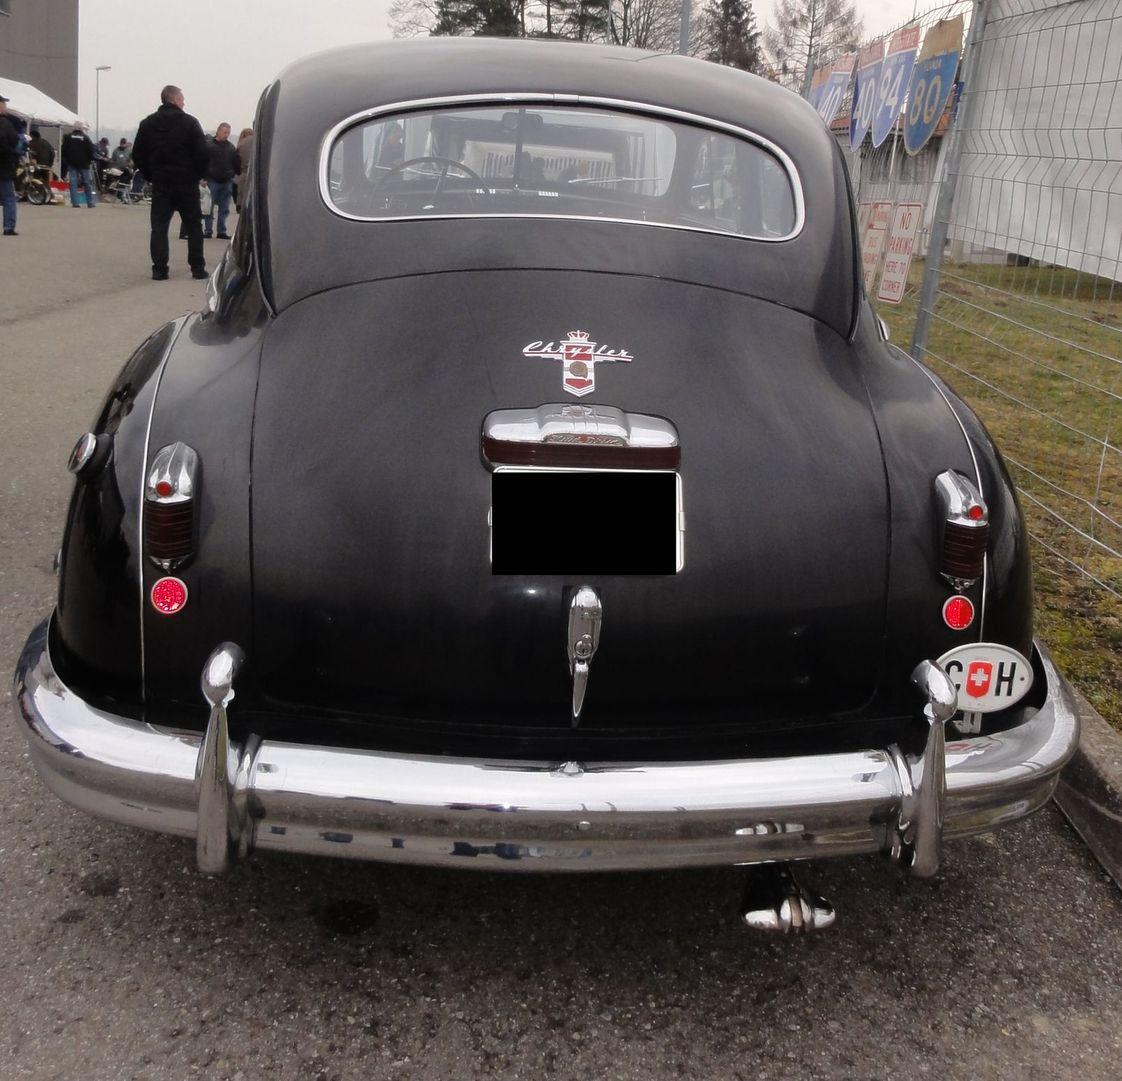 Autoalmanach, Les Marques: Chrysler(usa)